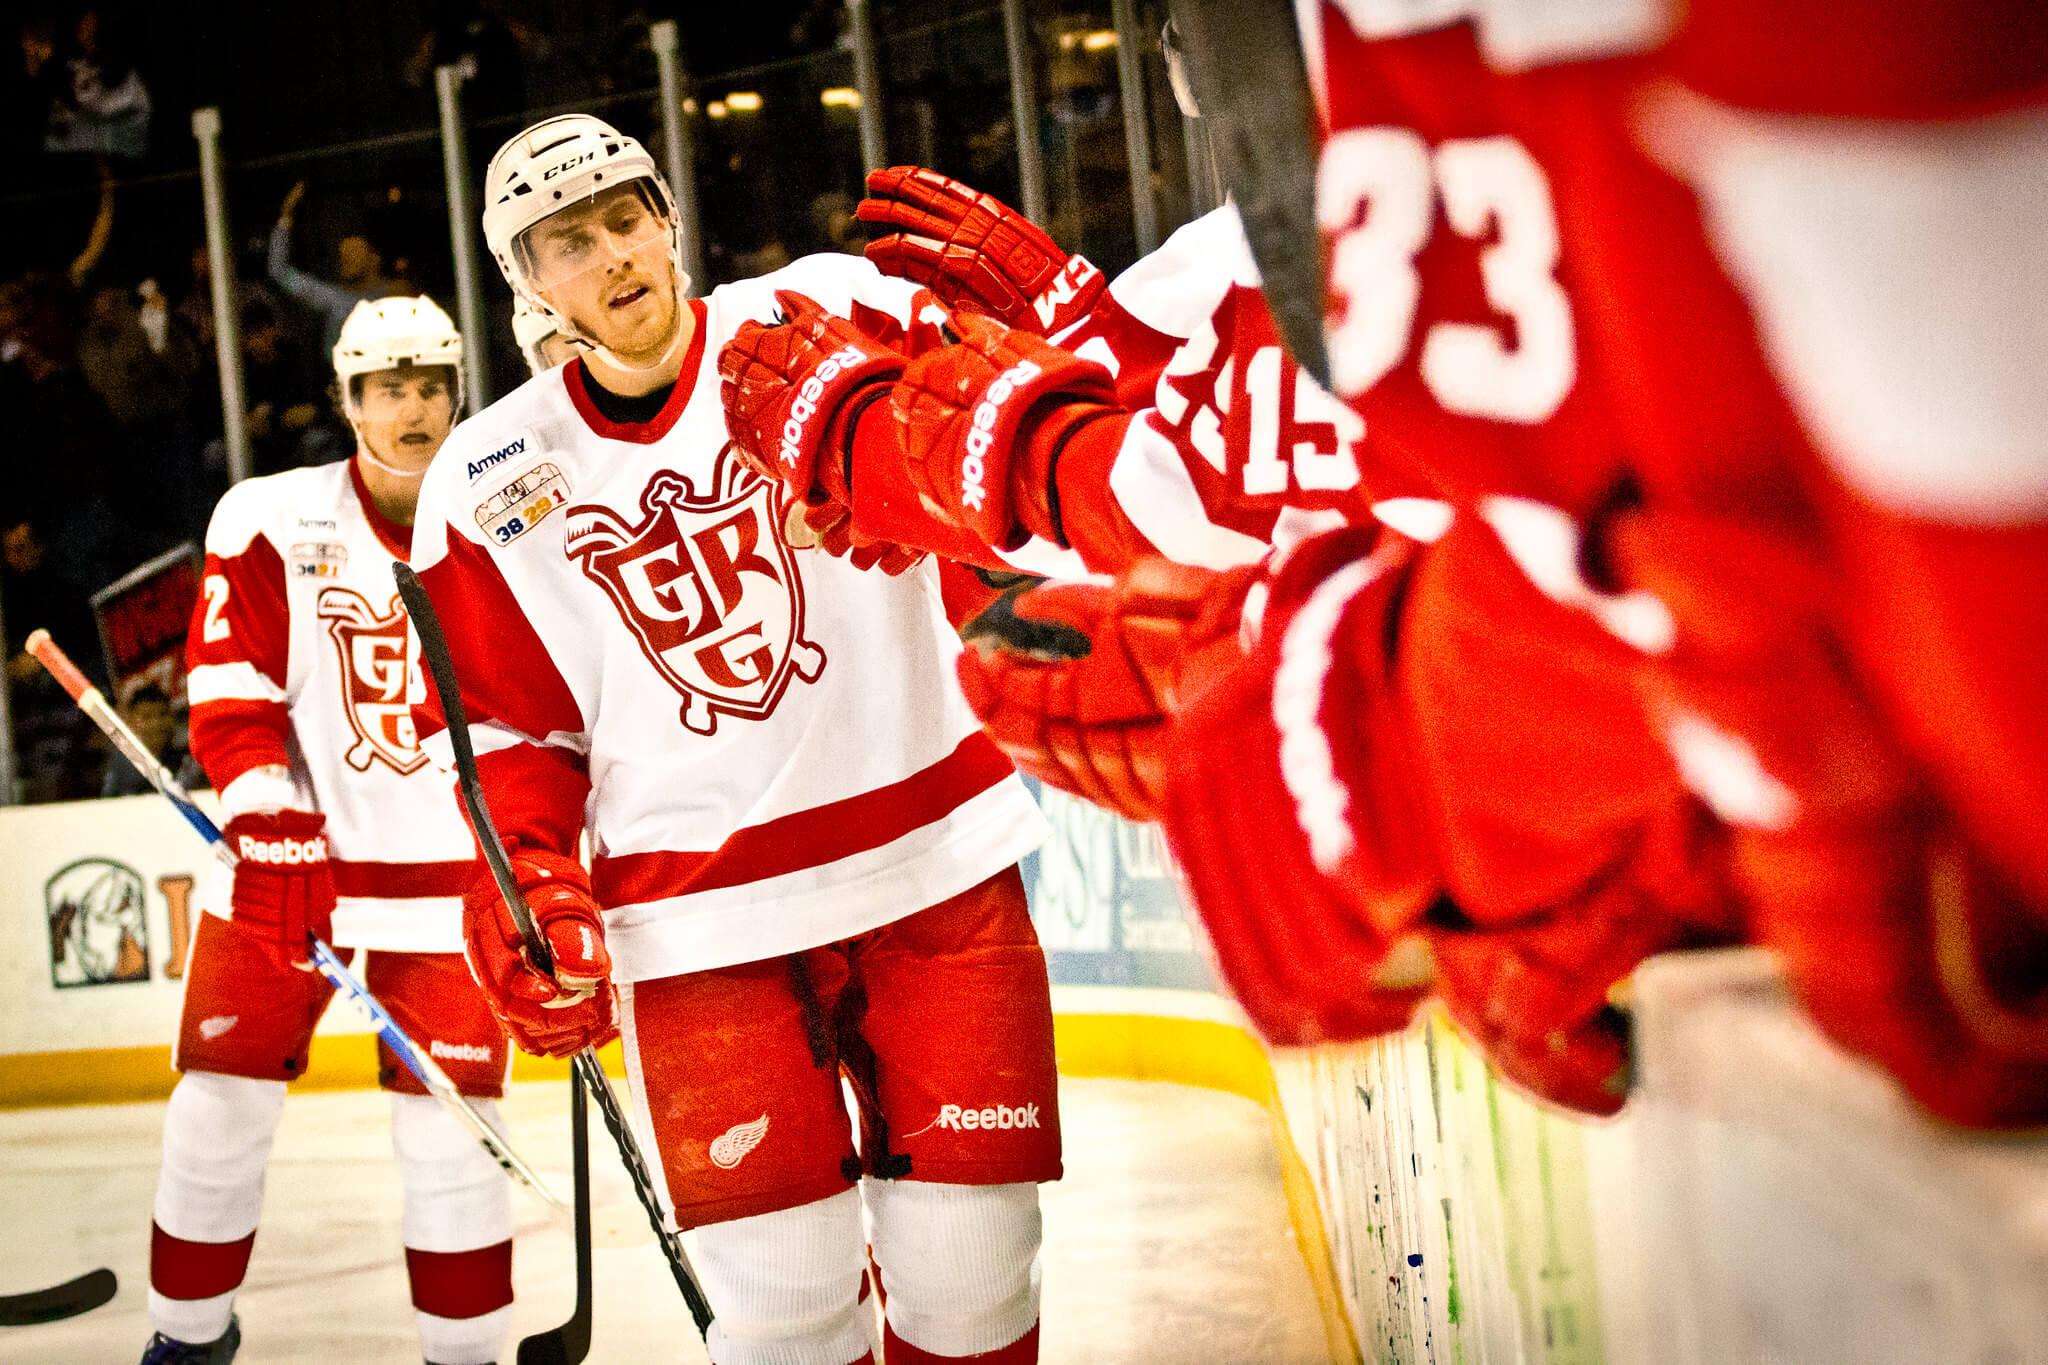 AHL Grand Rapids Griffins win hockey